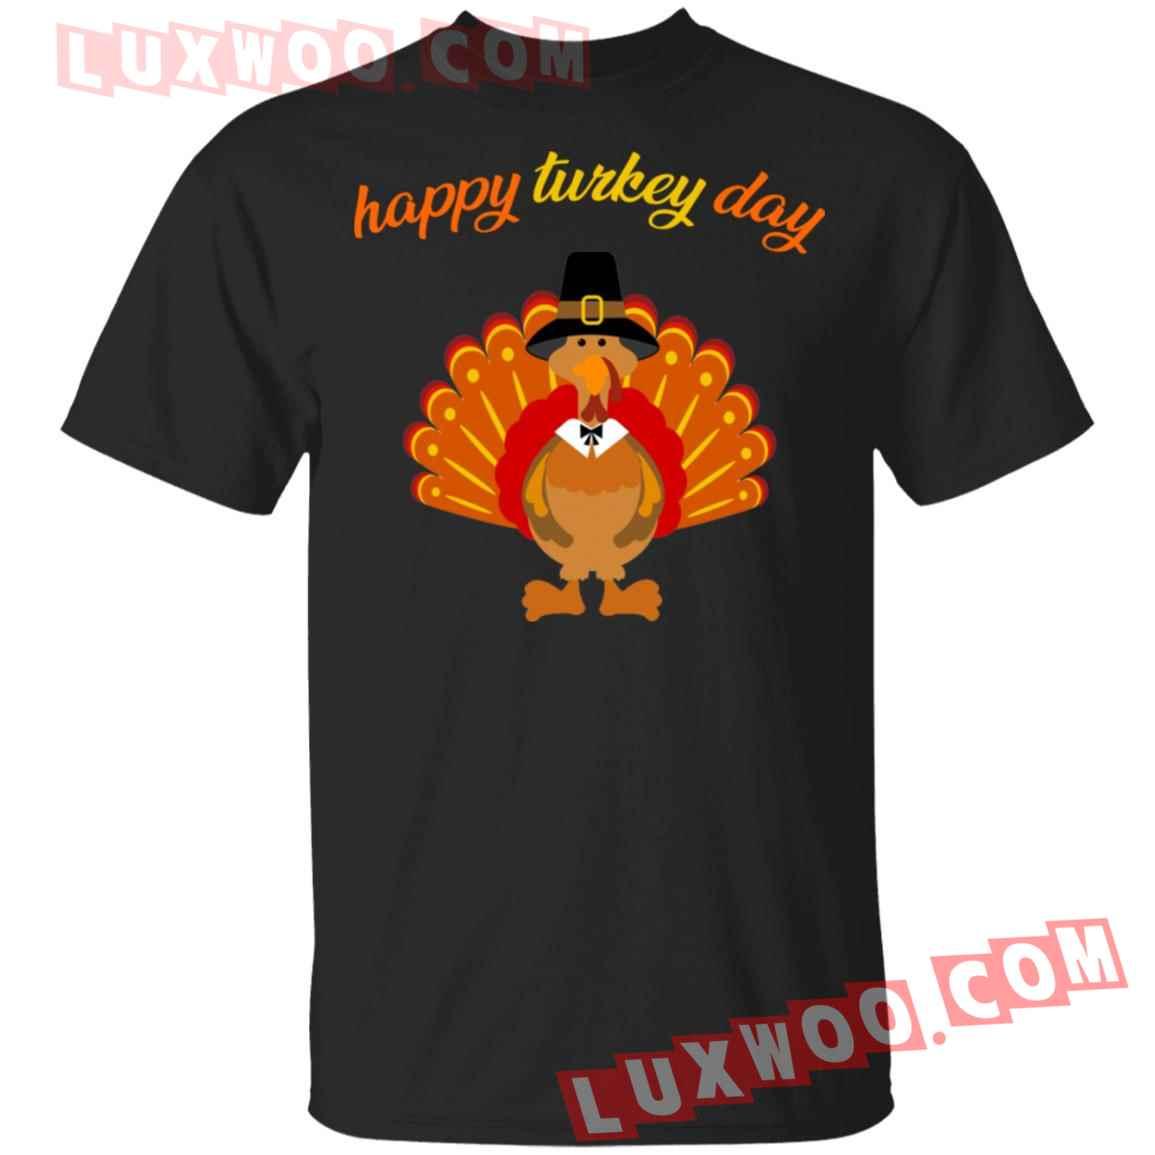 Happy Turkey Day Shirt